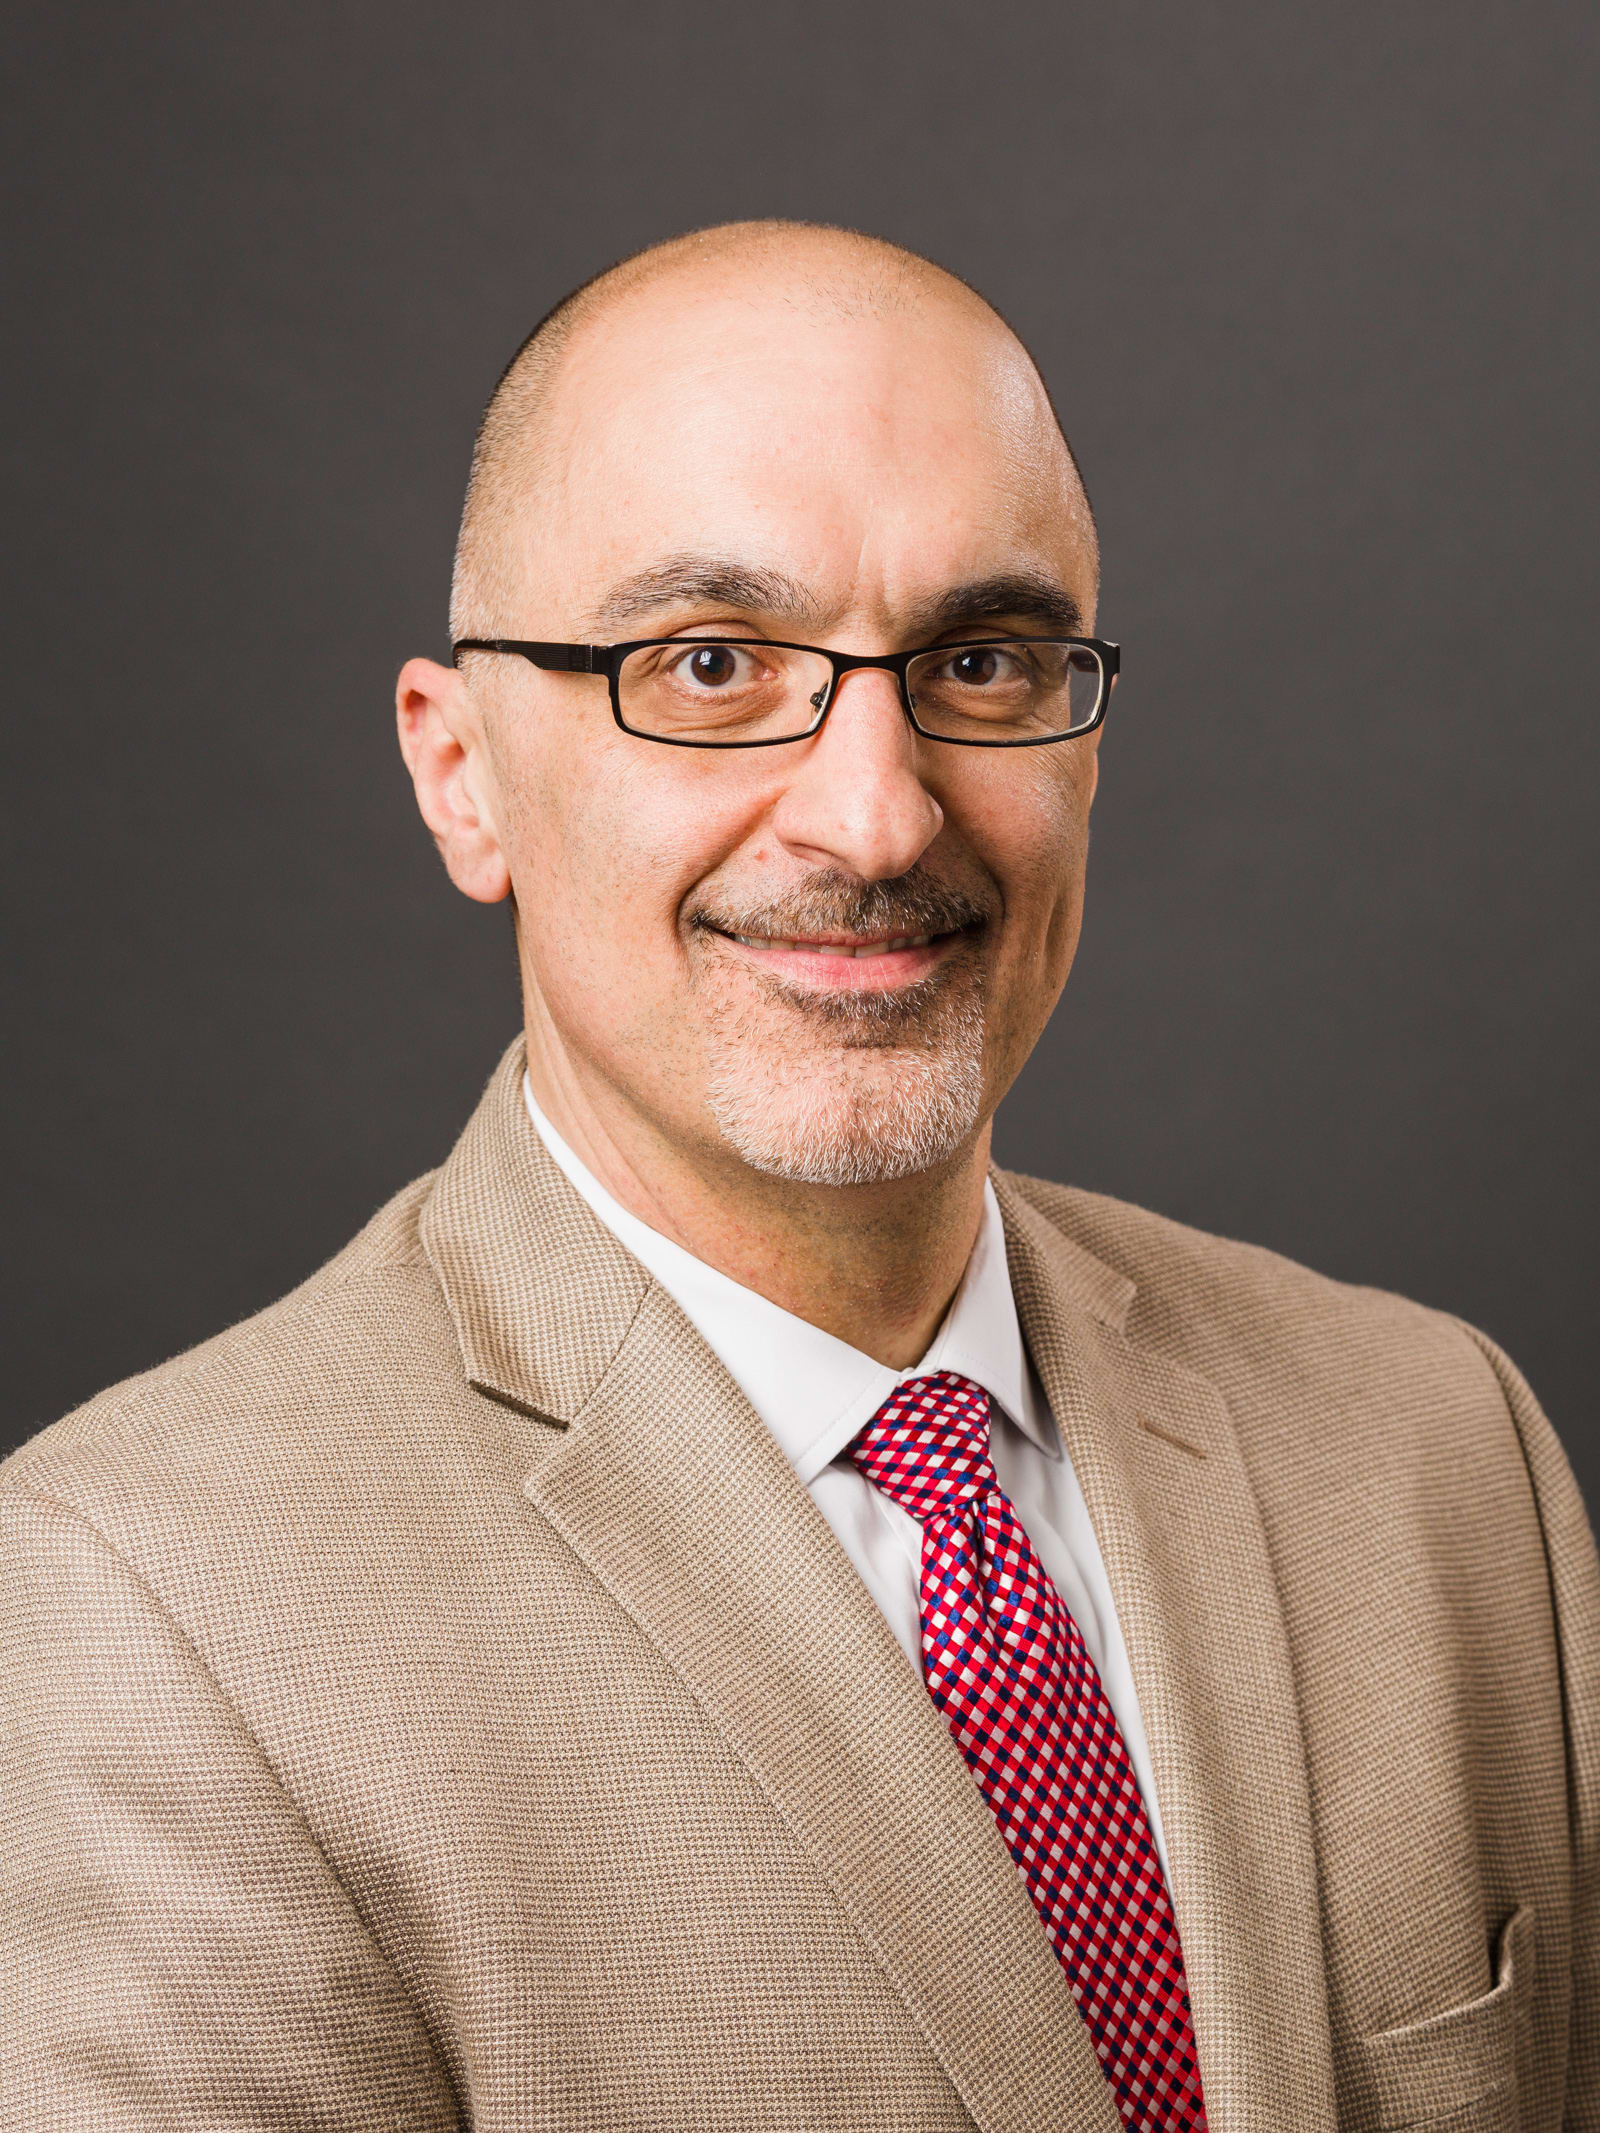 Matthew Bizzarro